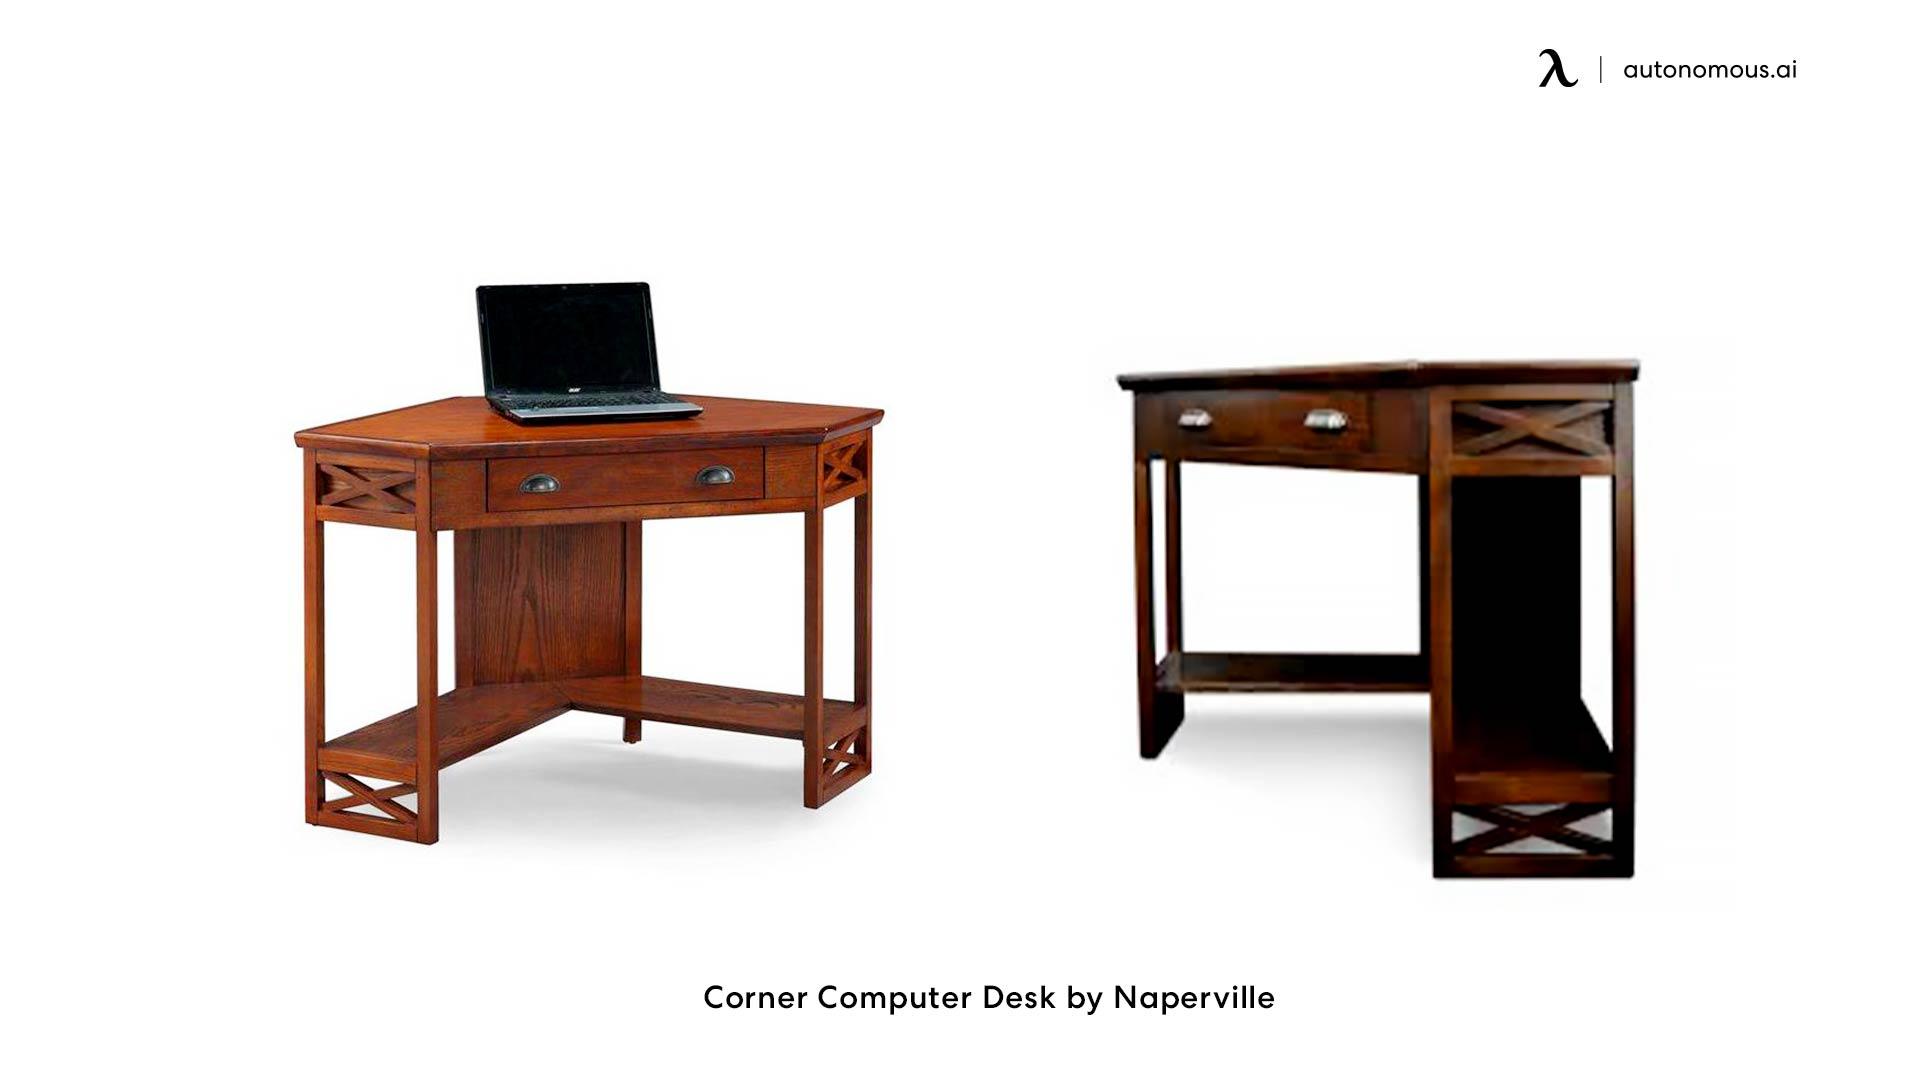 Corner Computer Desk by Naperville